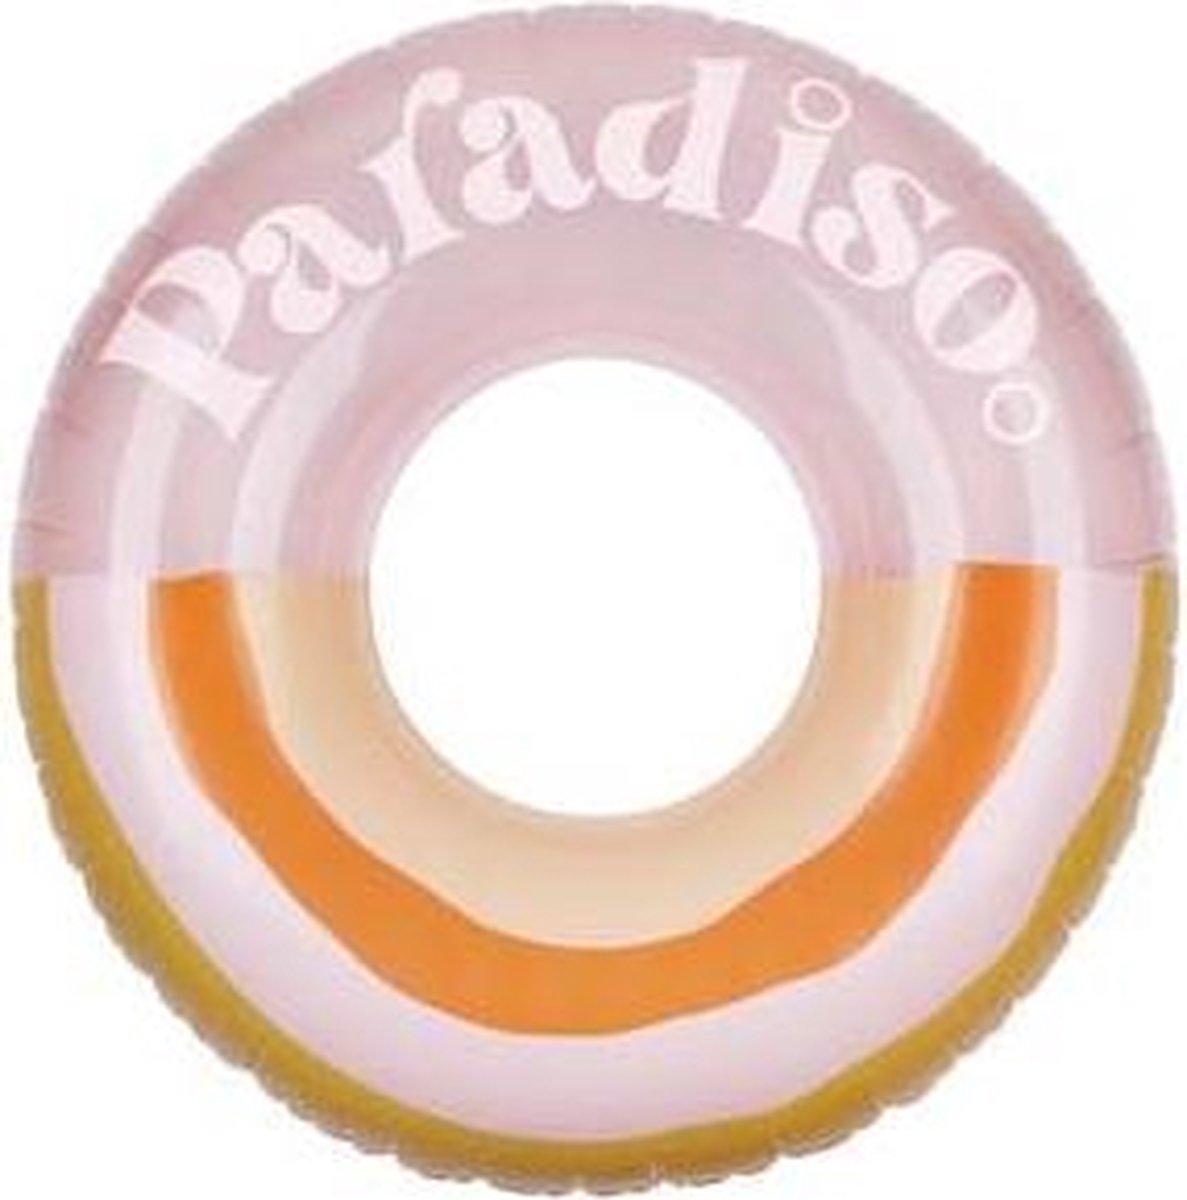 Sunnylife - Zwemband Paradiso - opblaasbaar - 110 x 110 x 35cm - max 100kg. - Multi color